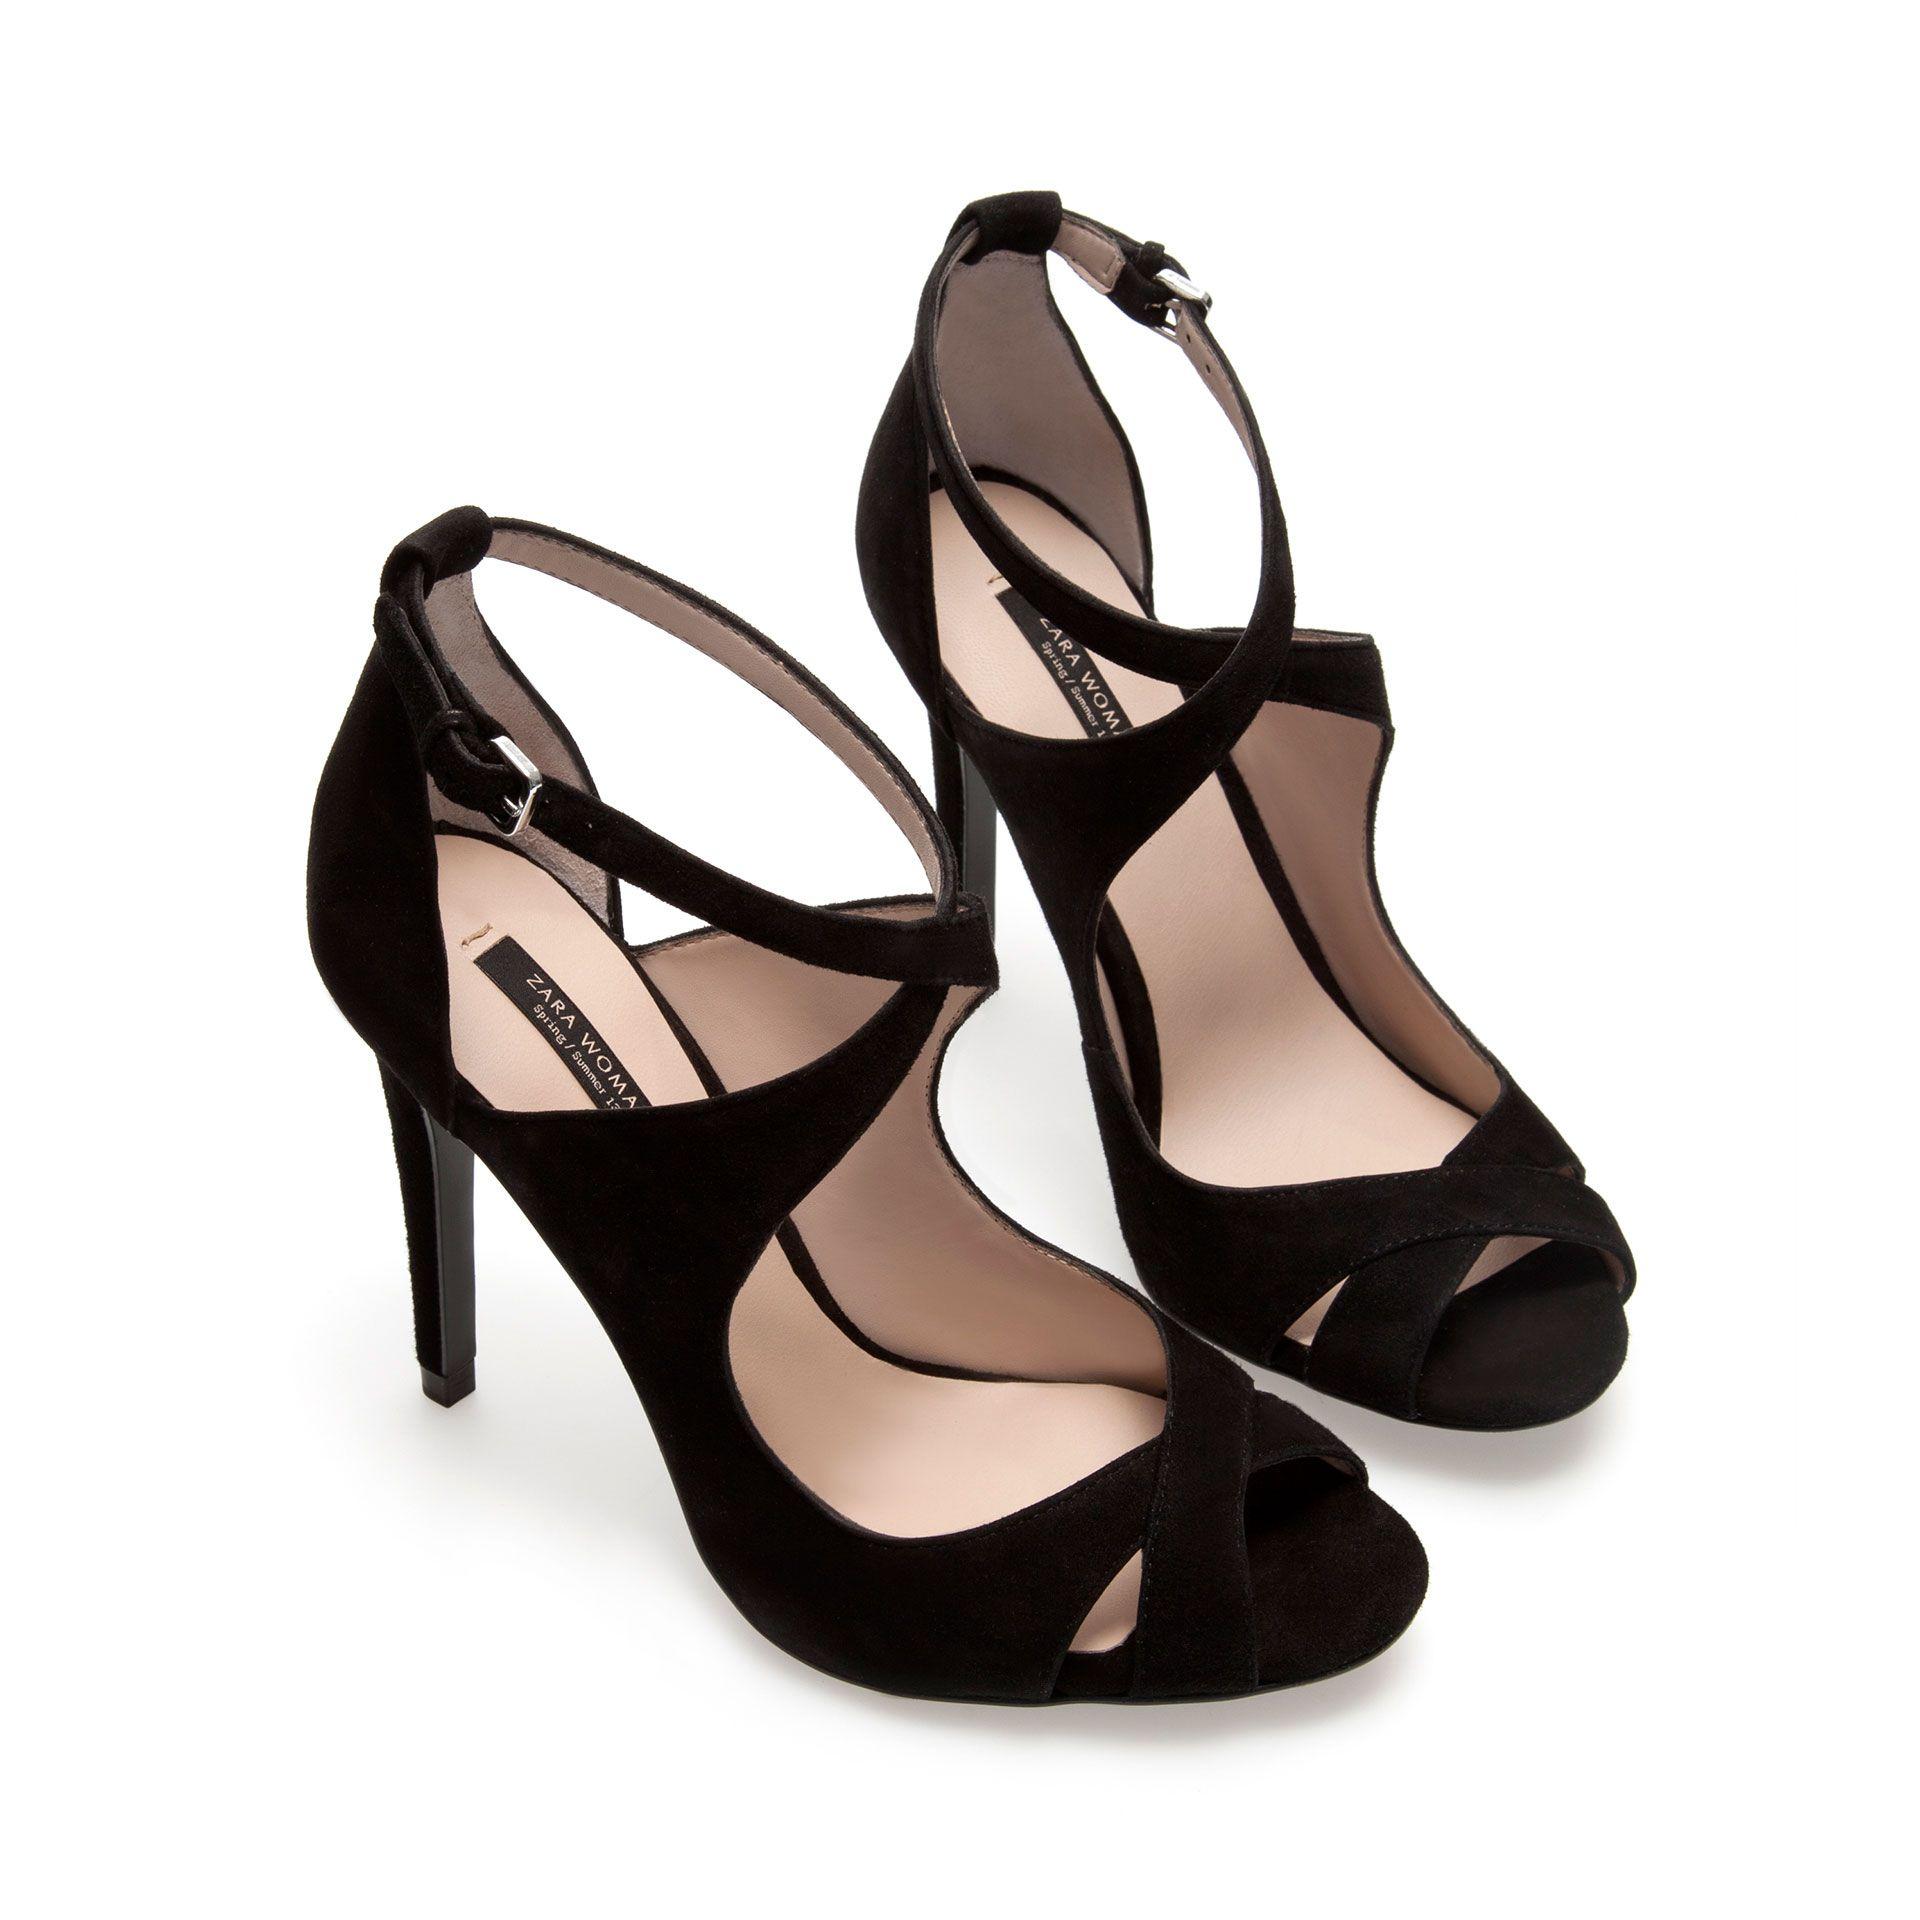 Colorado Haute Chaussures Noires Femmes eSHjaeTiAF